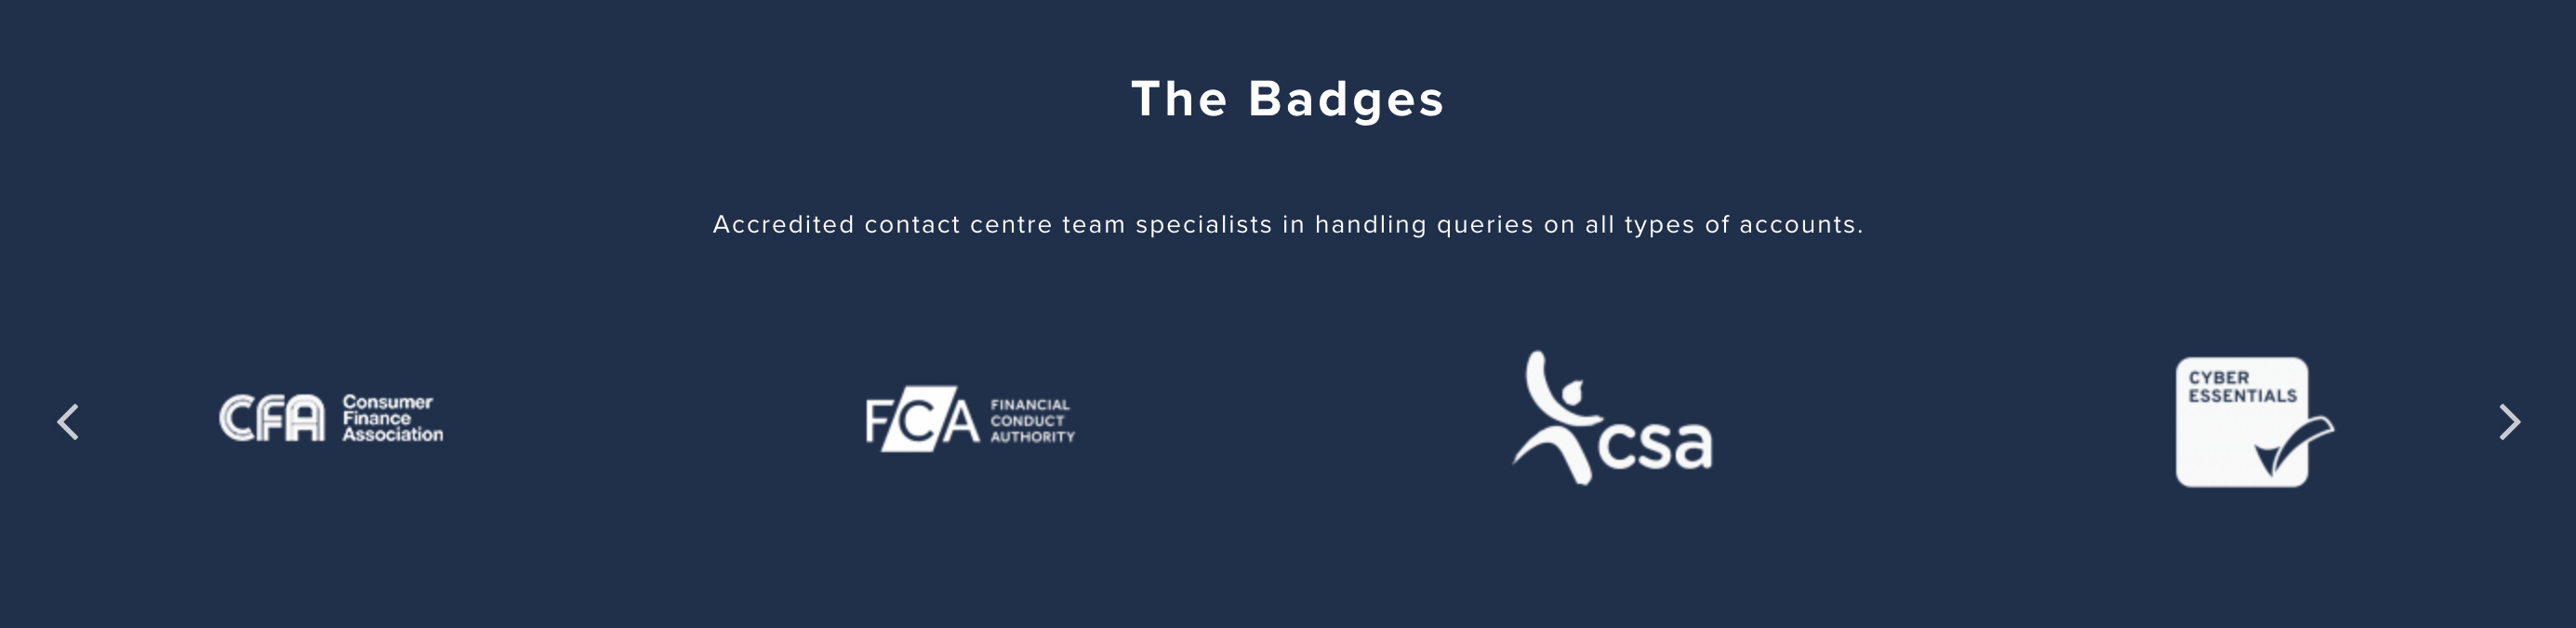 crs-badges